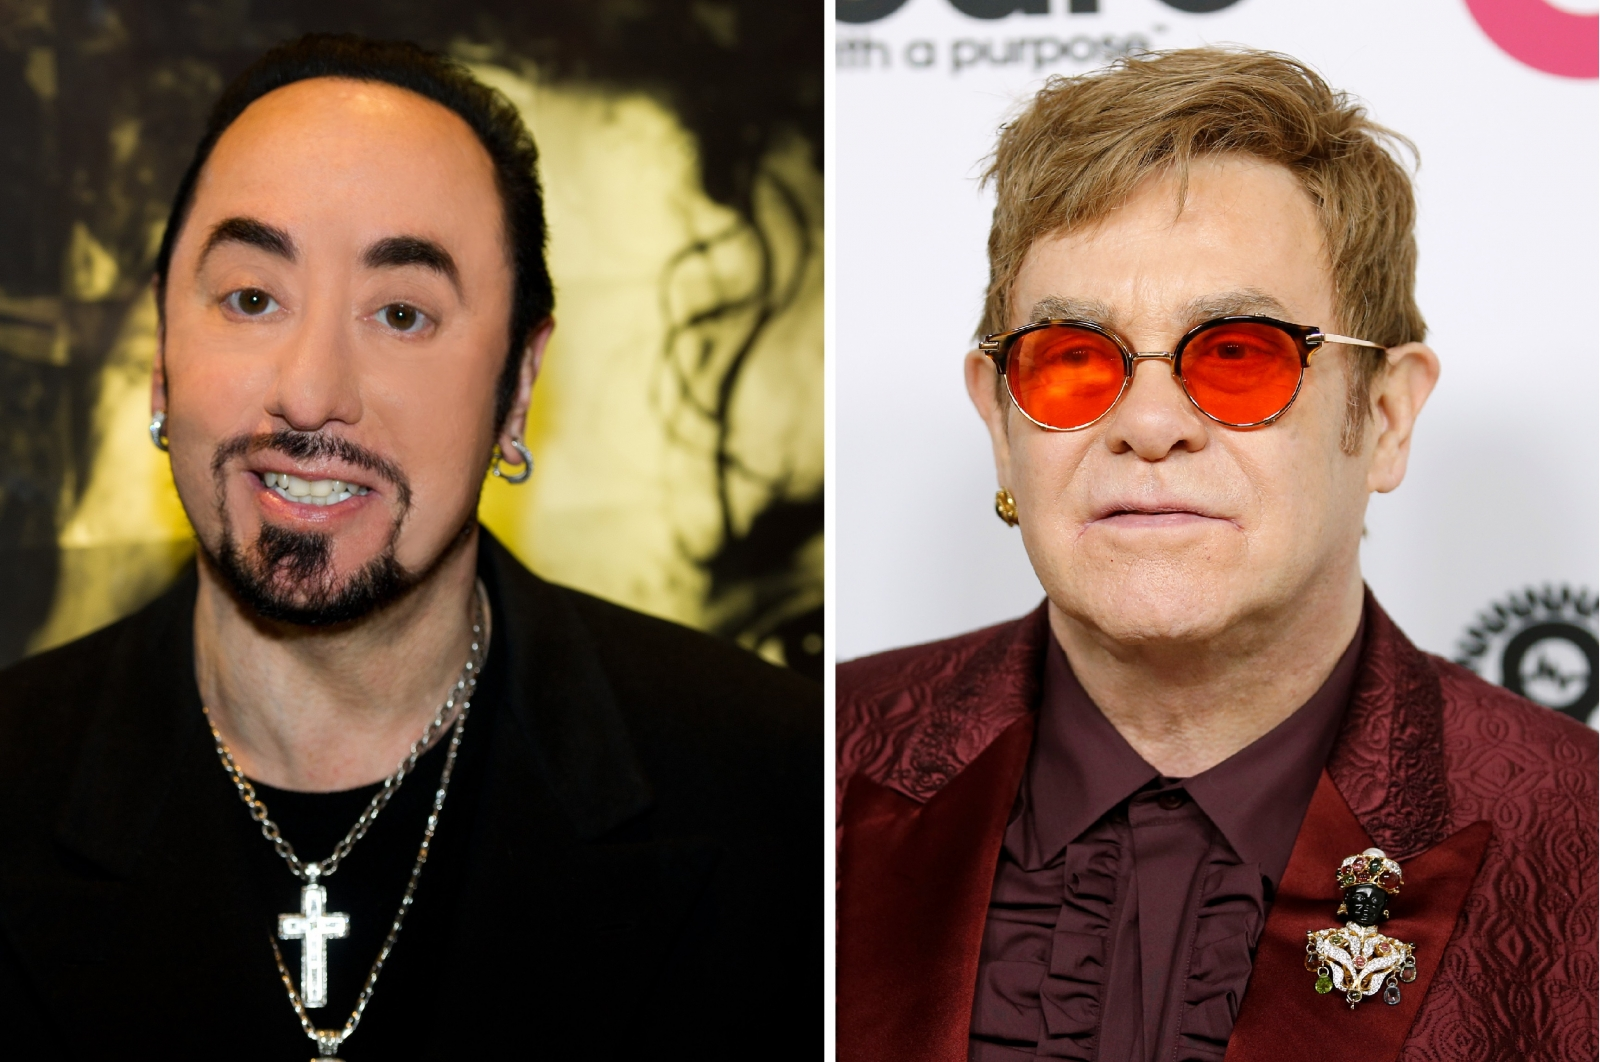 David Gest and Elton John